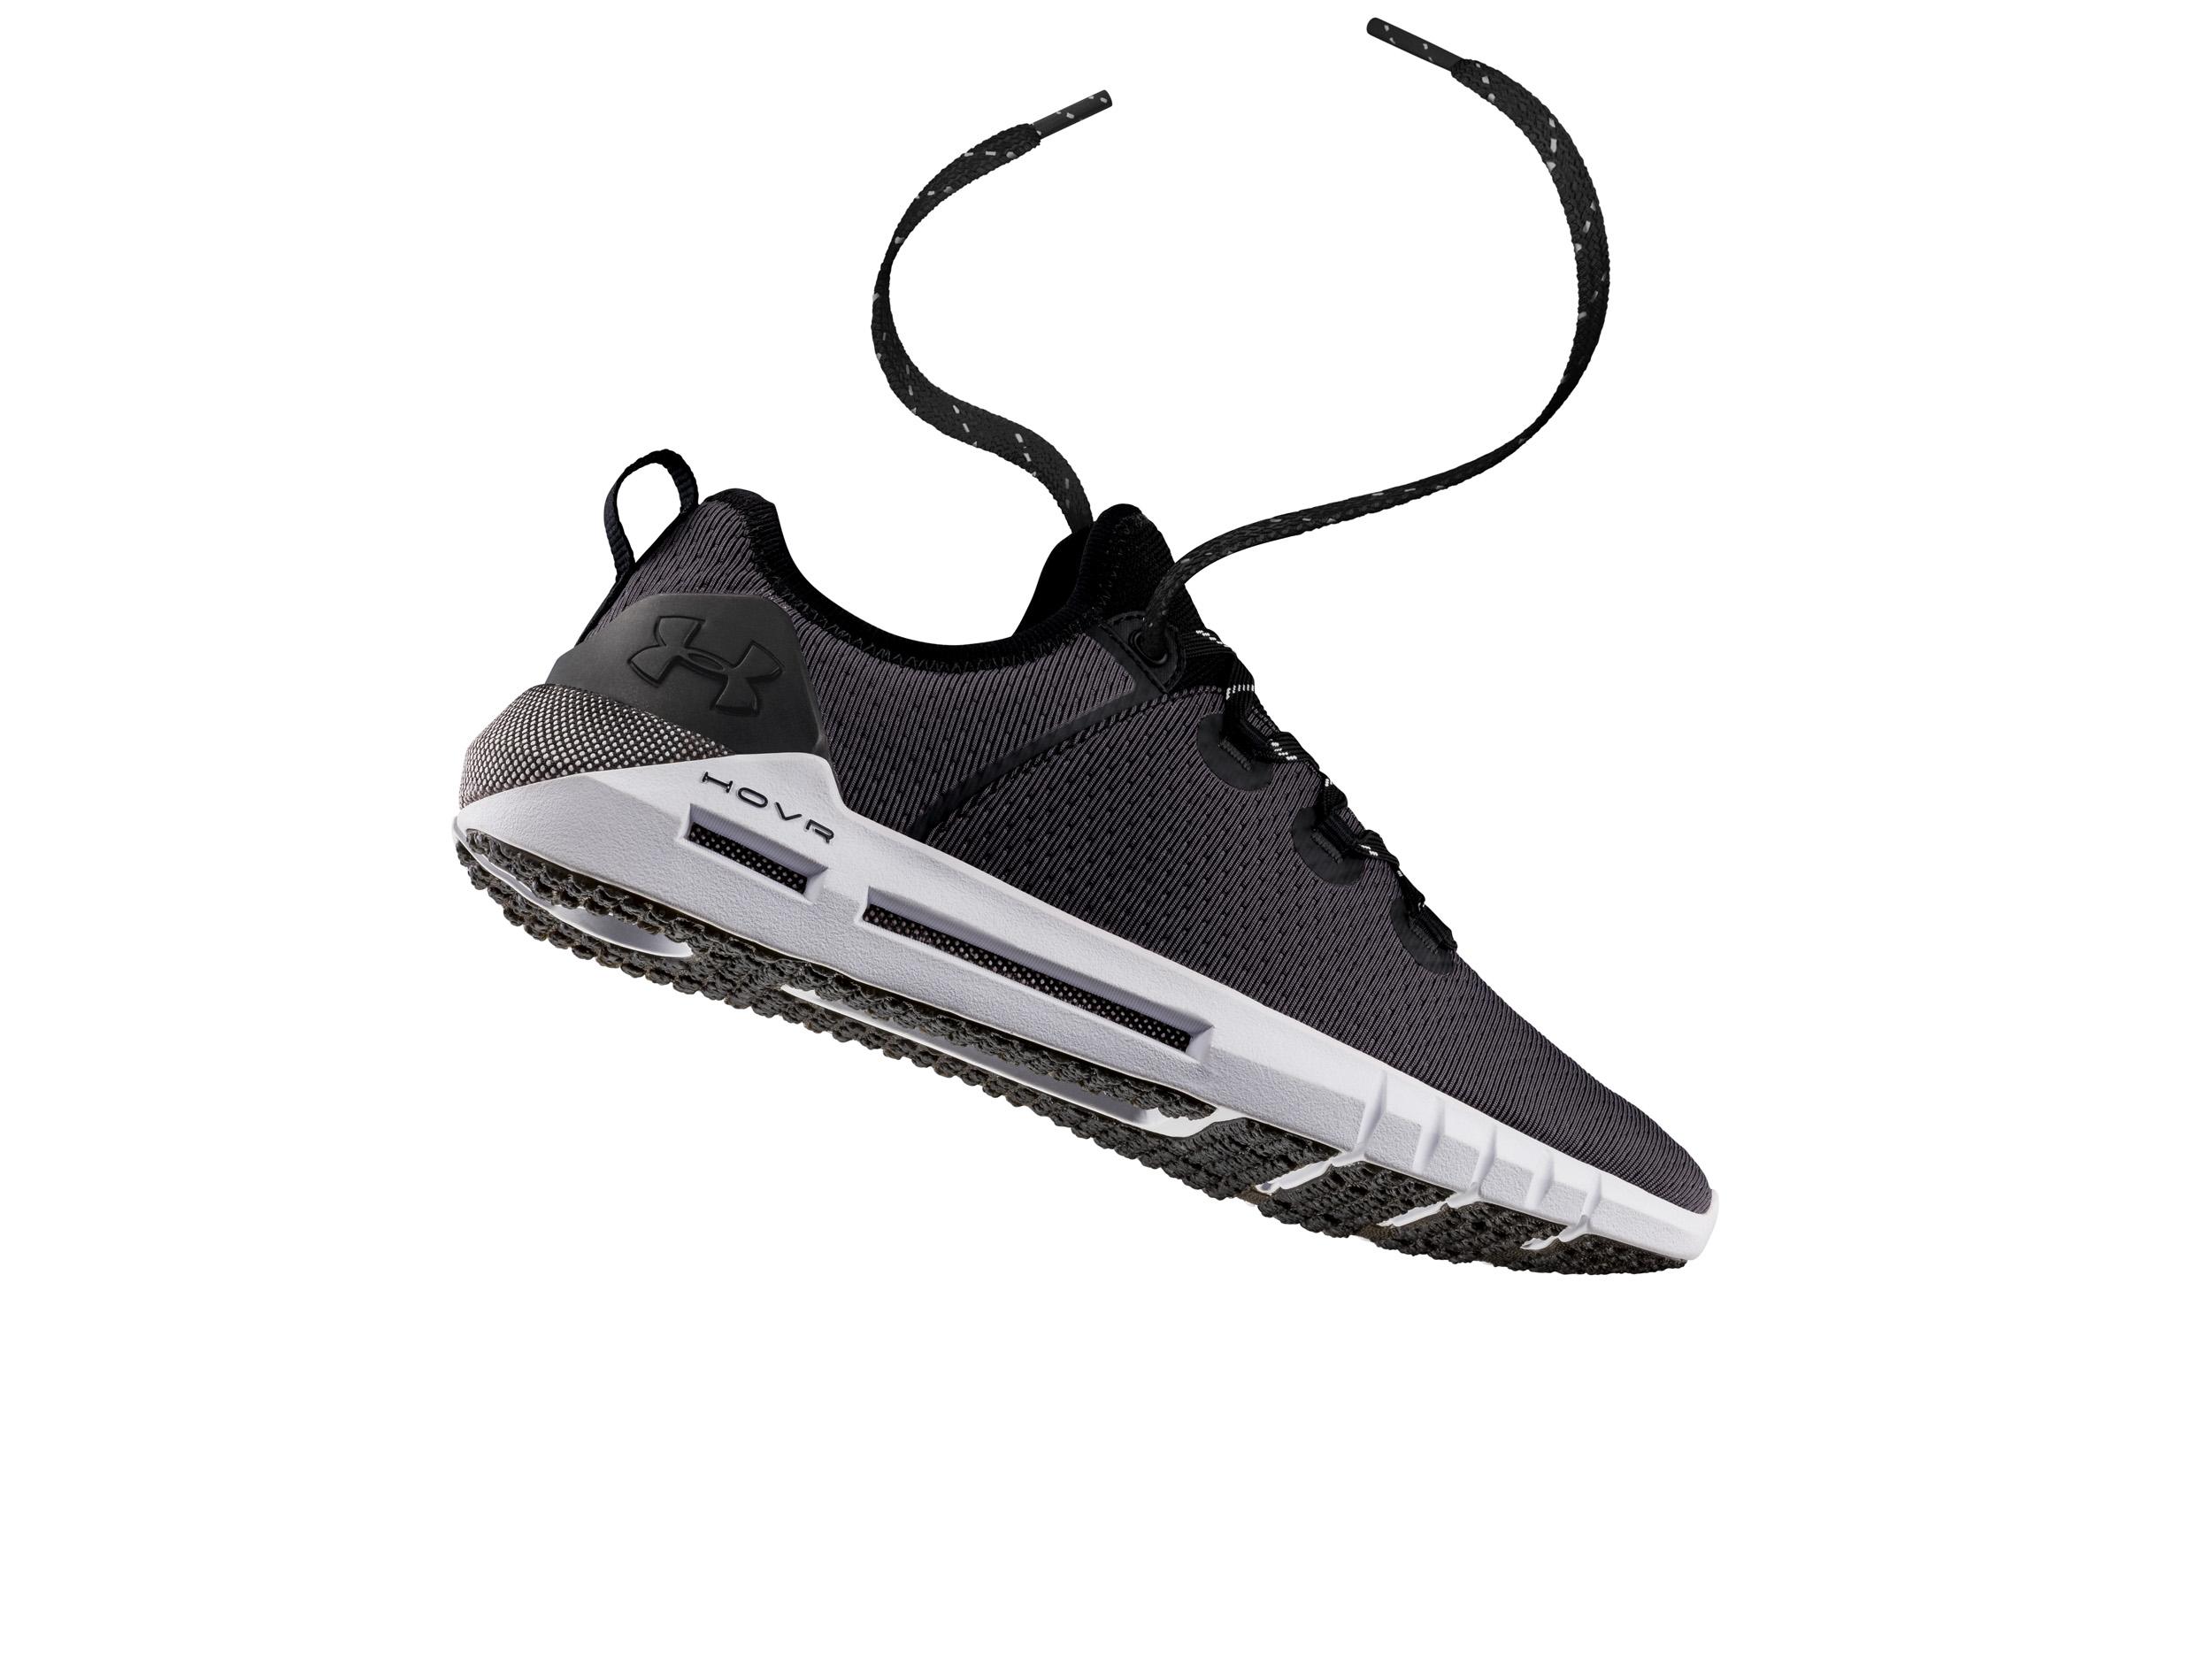 designer fashion 20125 b25bb Under Armour Introduces the HOVR SLK, a Lifestyle Shoe ...